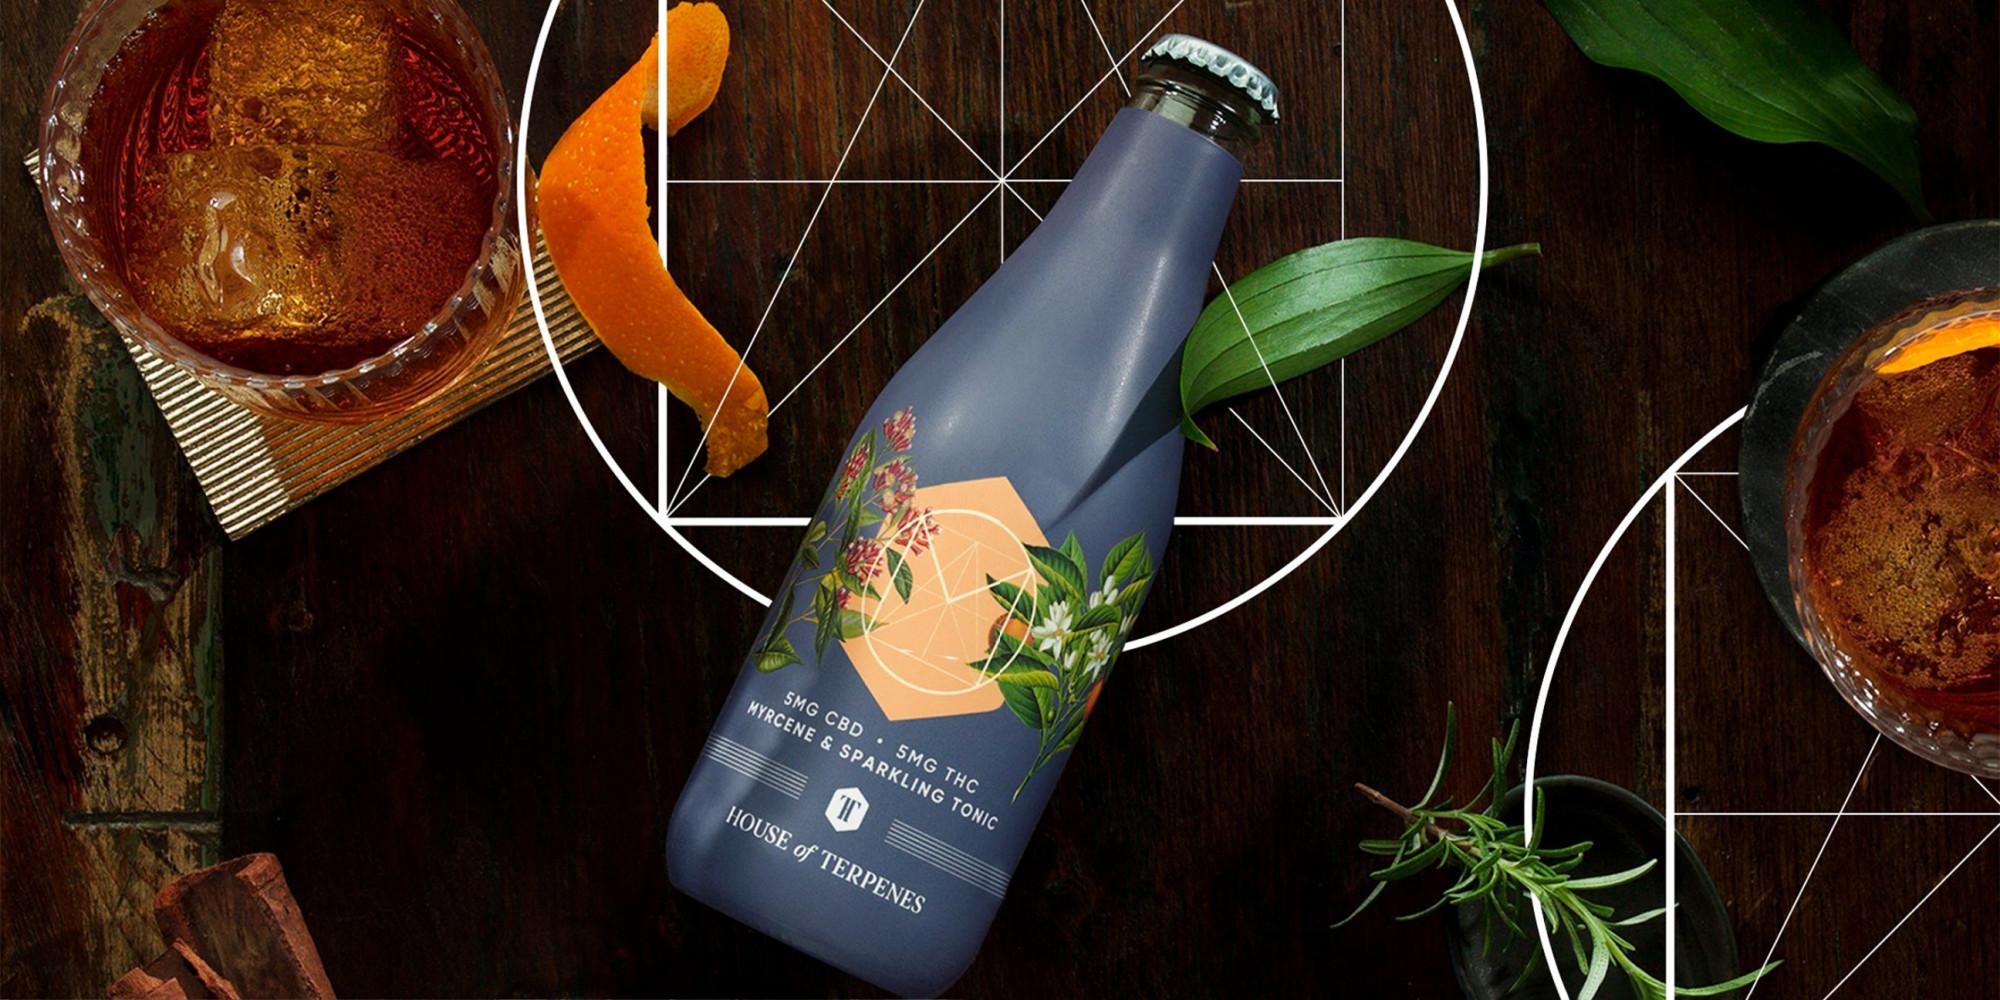 Truss Beverage Co. / House Of Terpenes